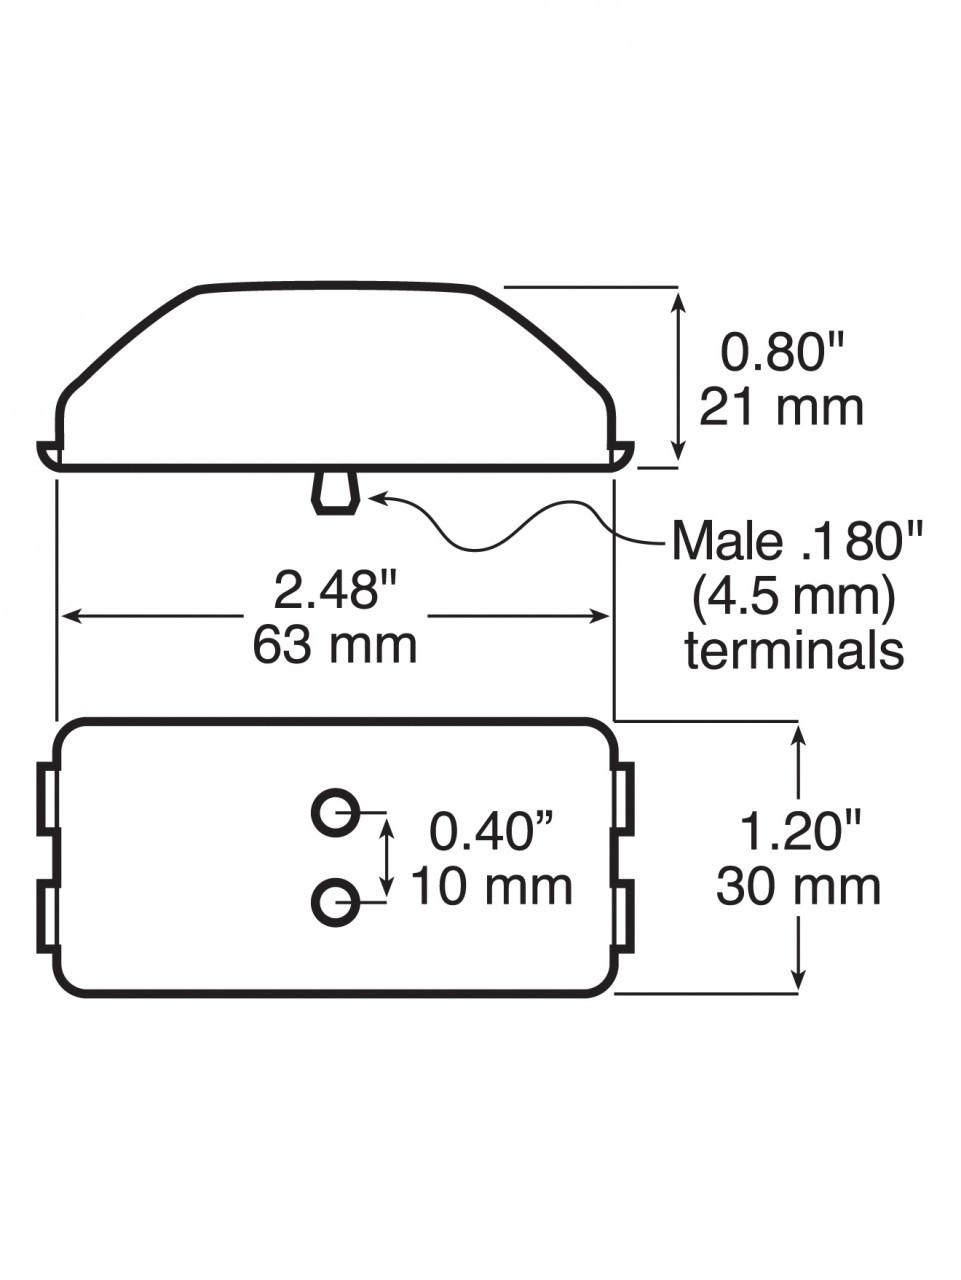 LED153A2 --- Rectangular Sealed LED Clearance/Side Marker Light - 2 Diodes